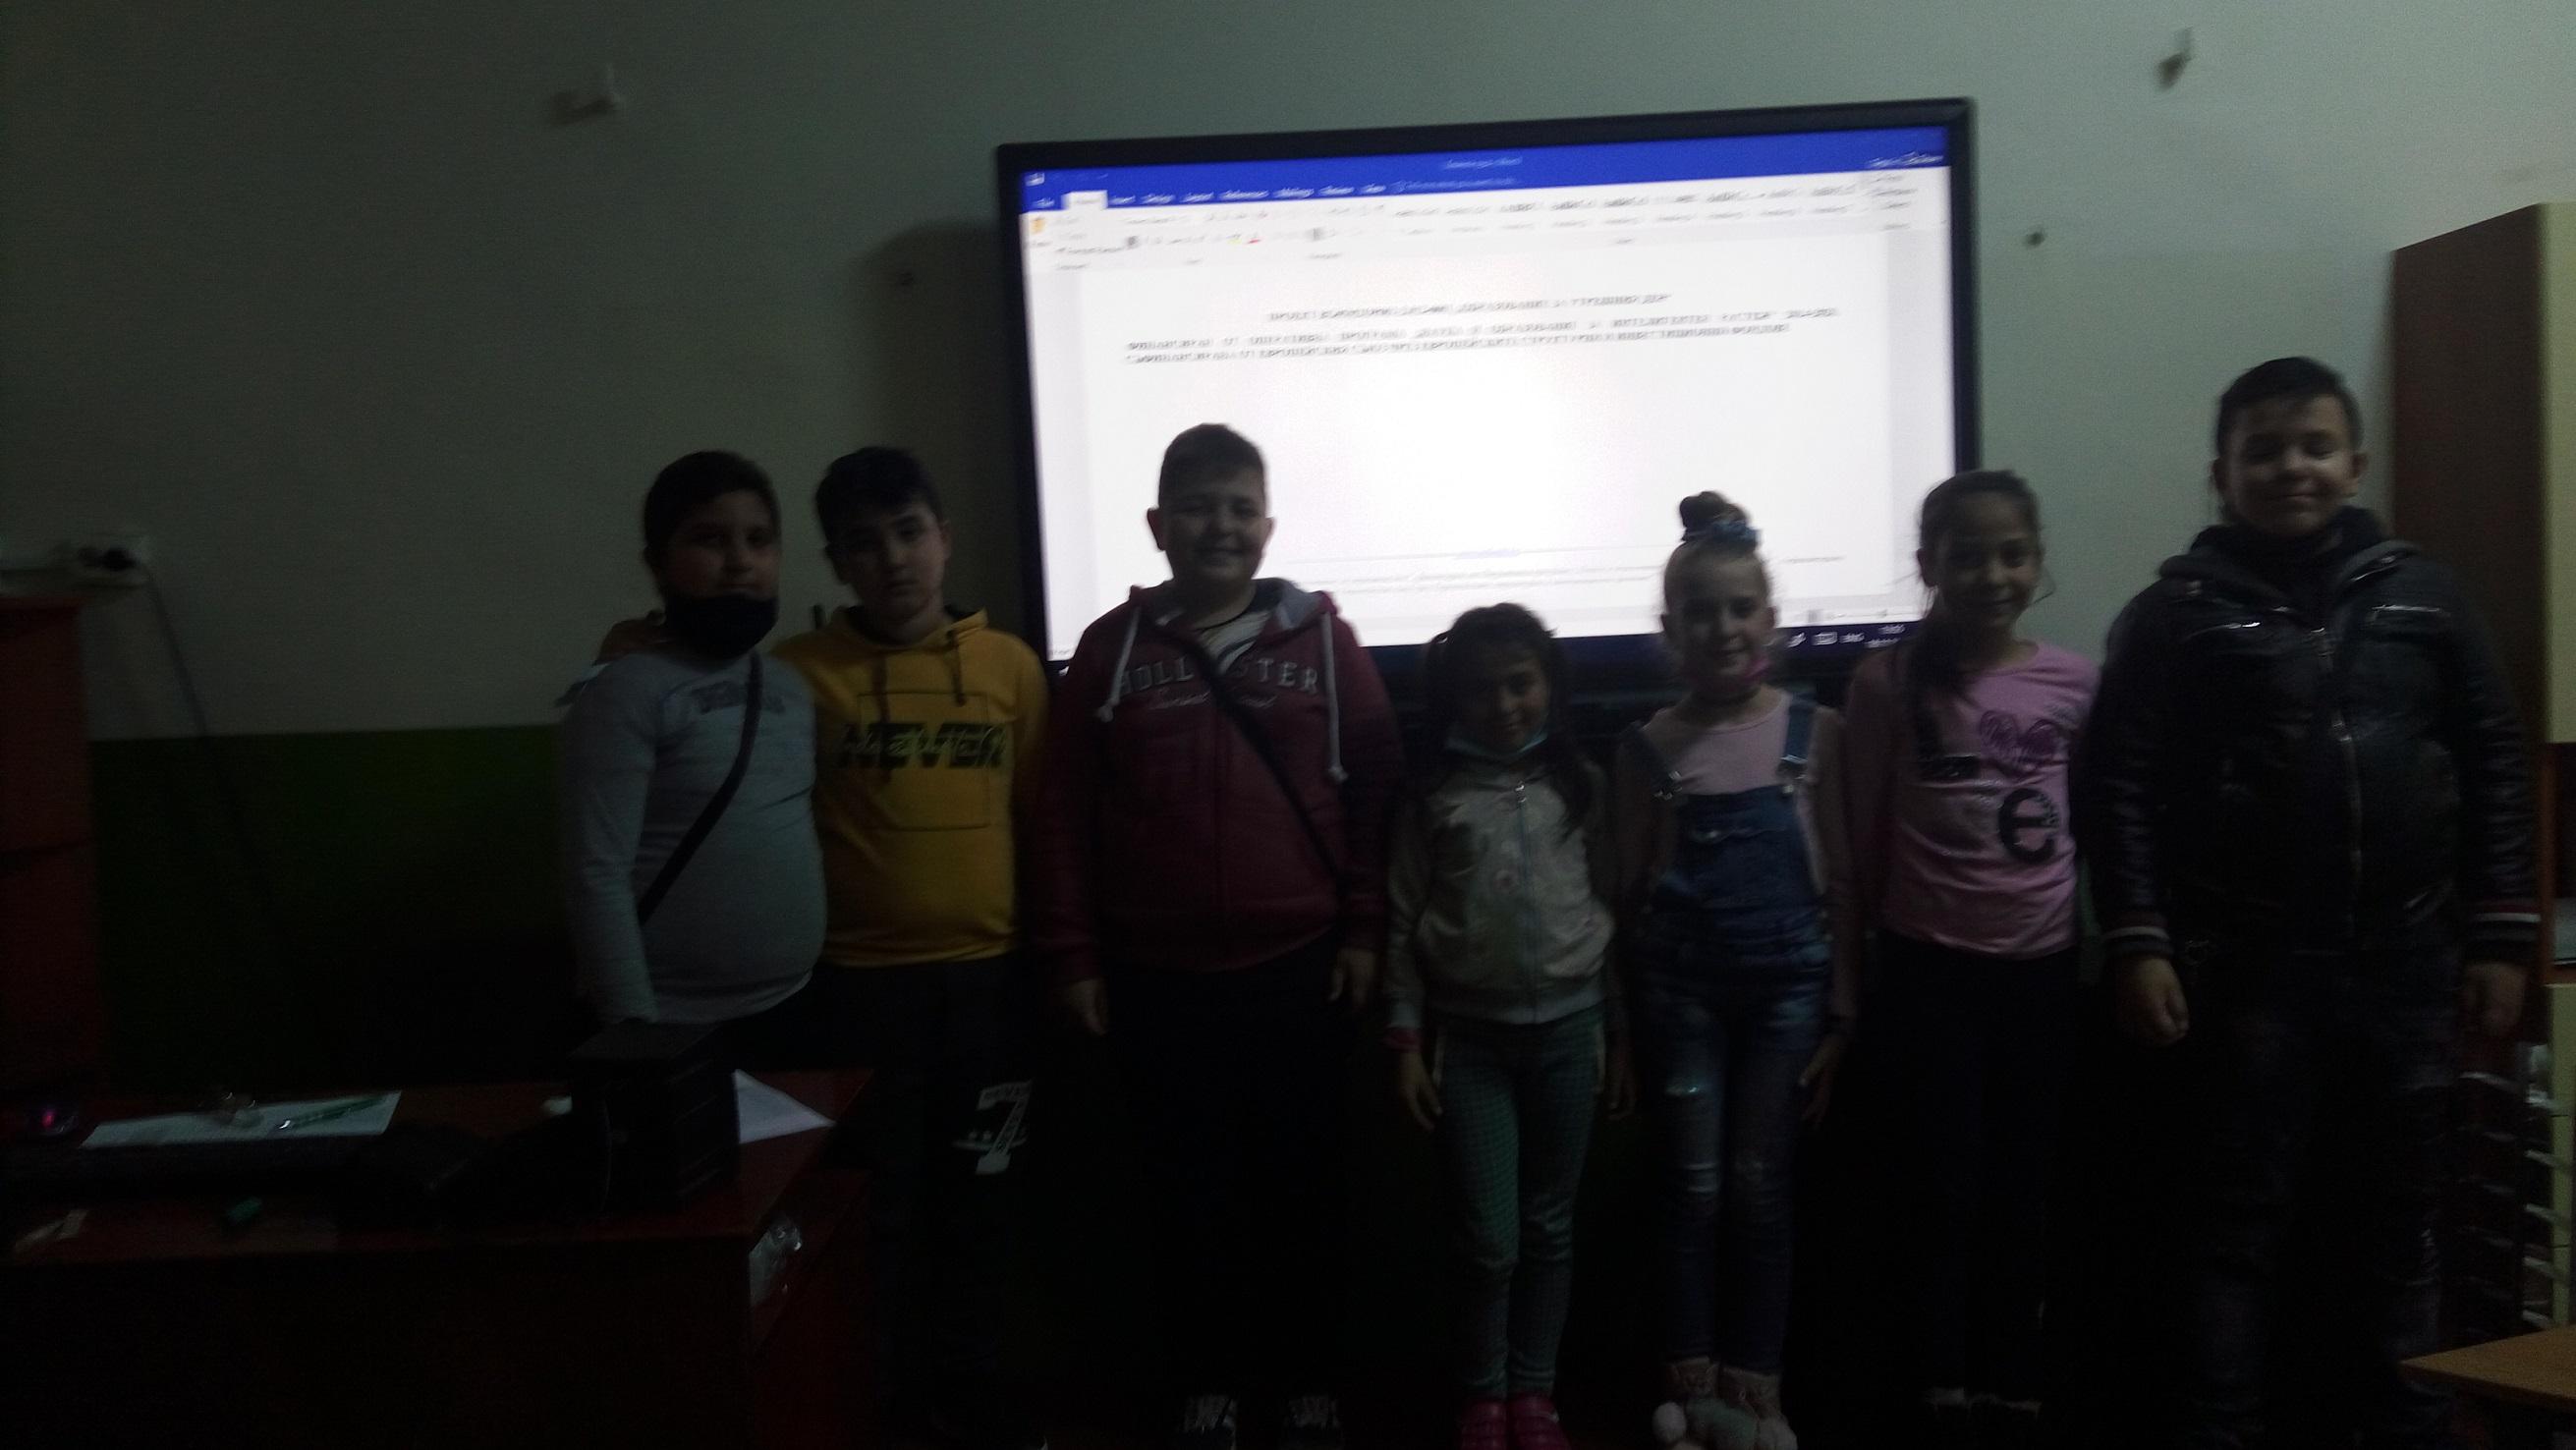 Група за формиране и развитие на ключови дигитални компетентности